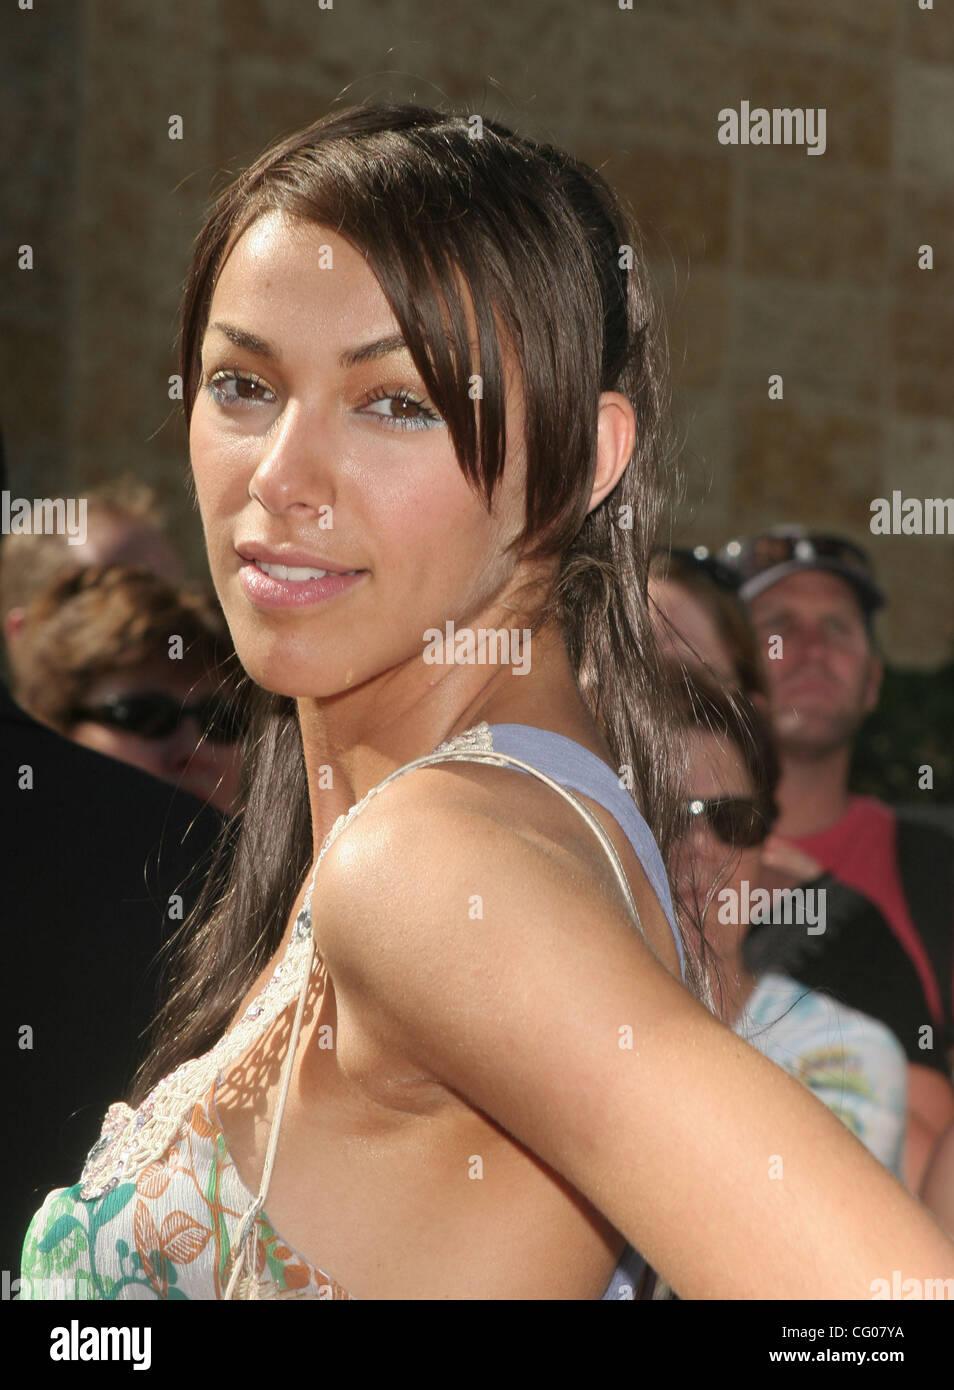 Louise Vyent NED,Indira Varma (born 1973) XXX pics Emily O'Brien born May 28, 1985 (age 33),Sofia Richie